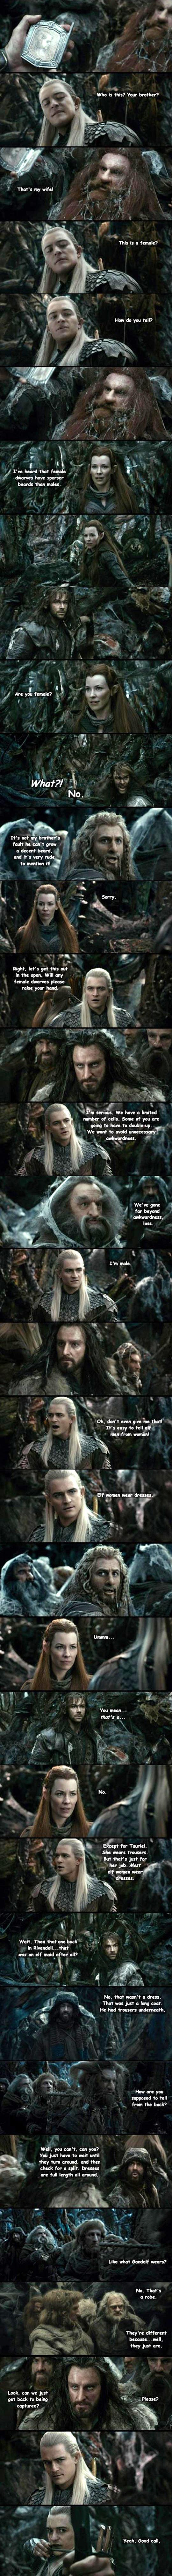 Elves And Dwarves Conundrum